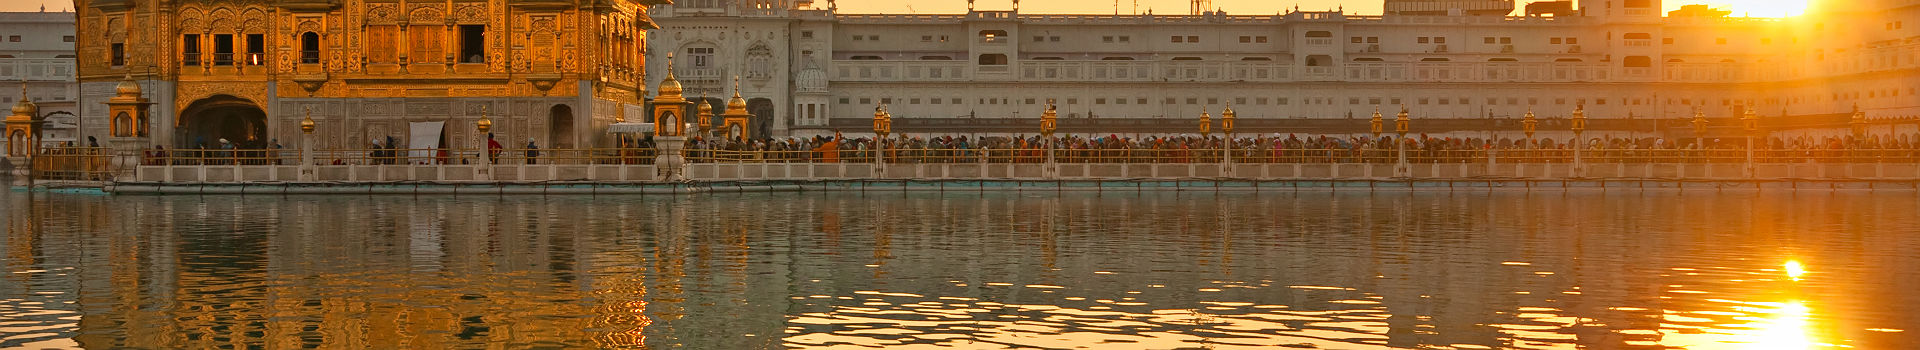 en ligne de rencontres Amritsar